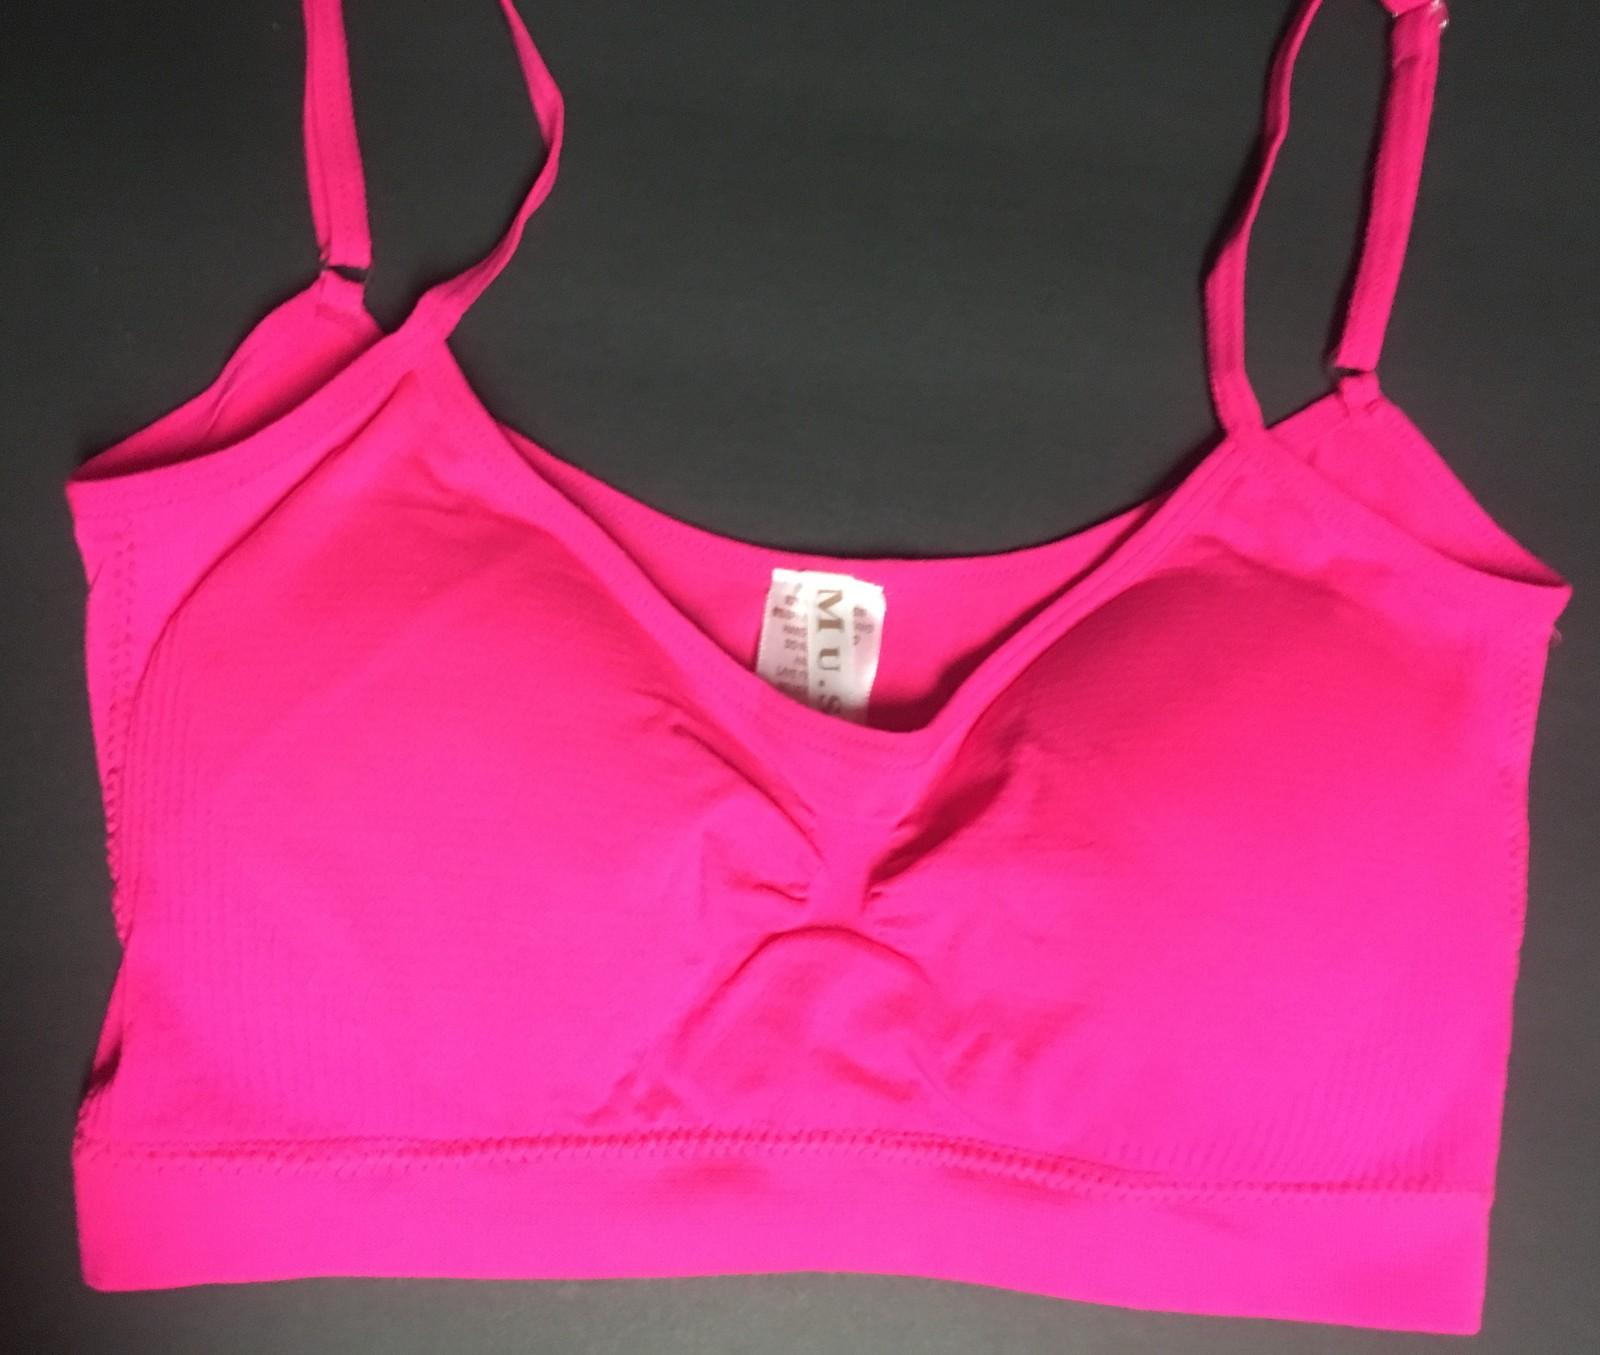 Women's Sport Support Bra Hot Pink SZ Medium Light Padding Adj Straps